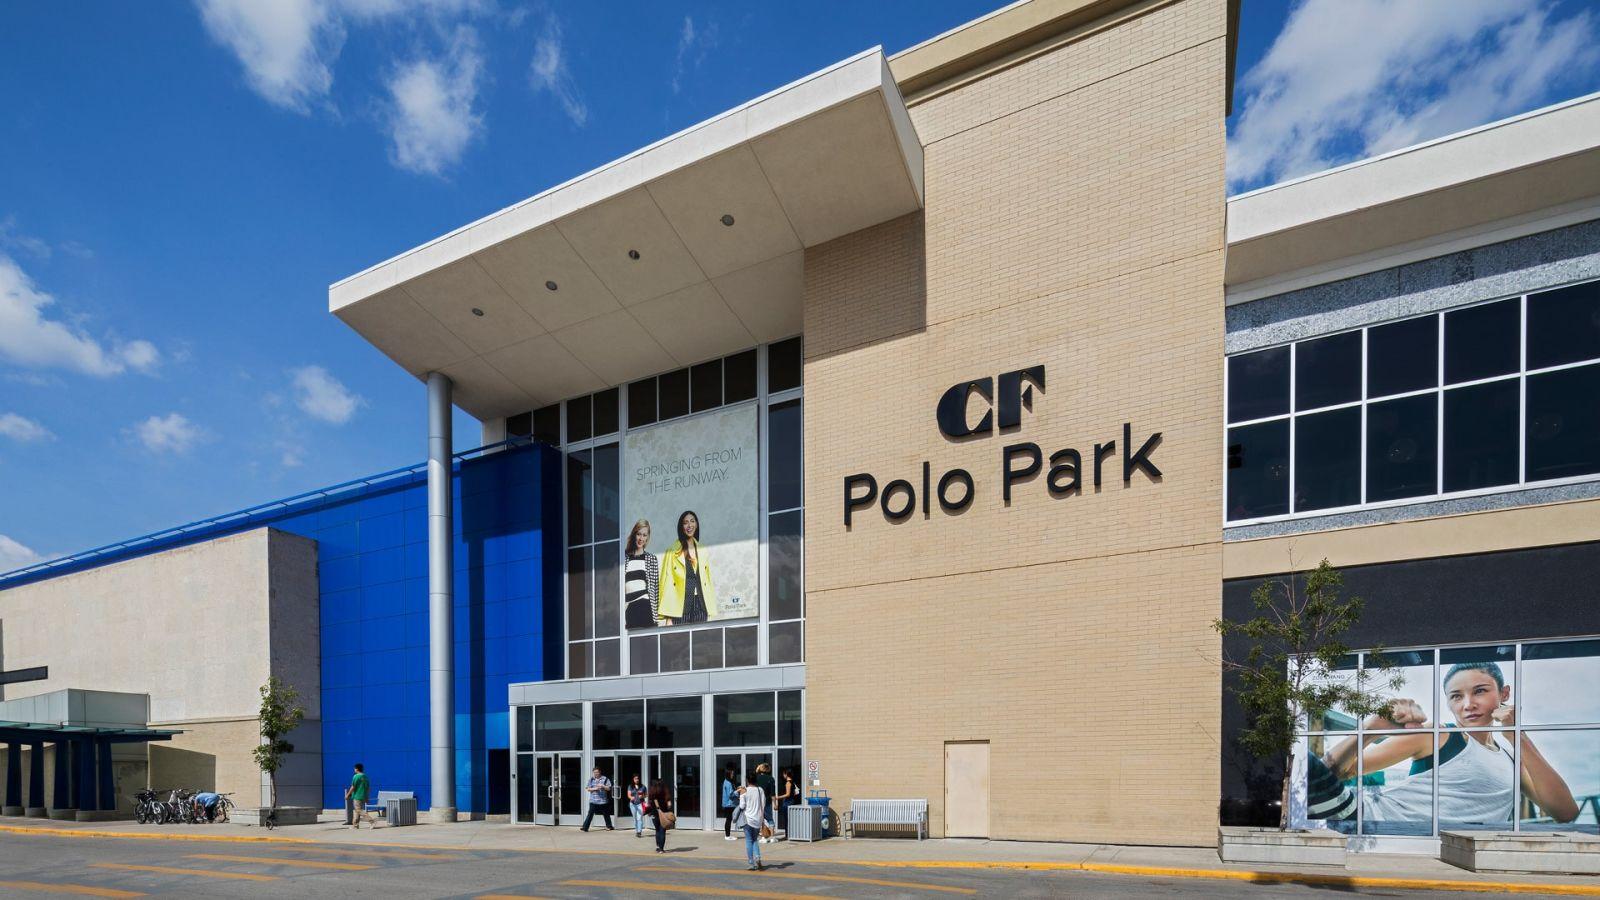 [CF Polo Park] - Day time shot